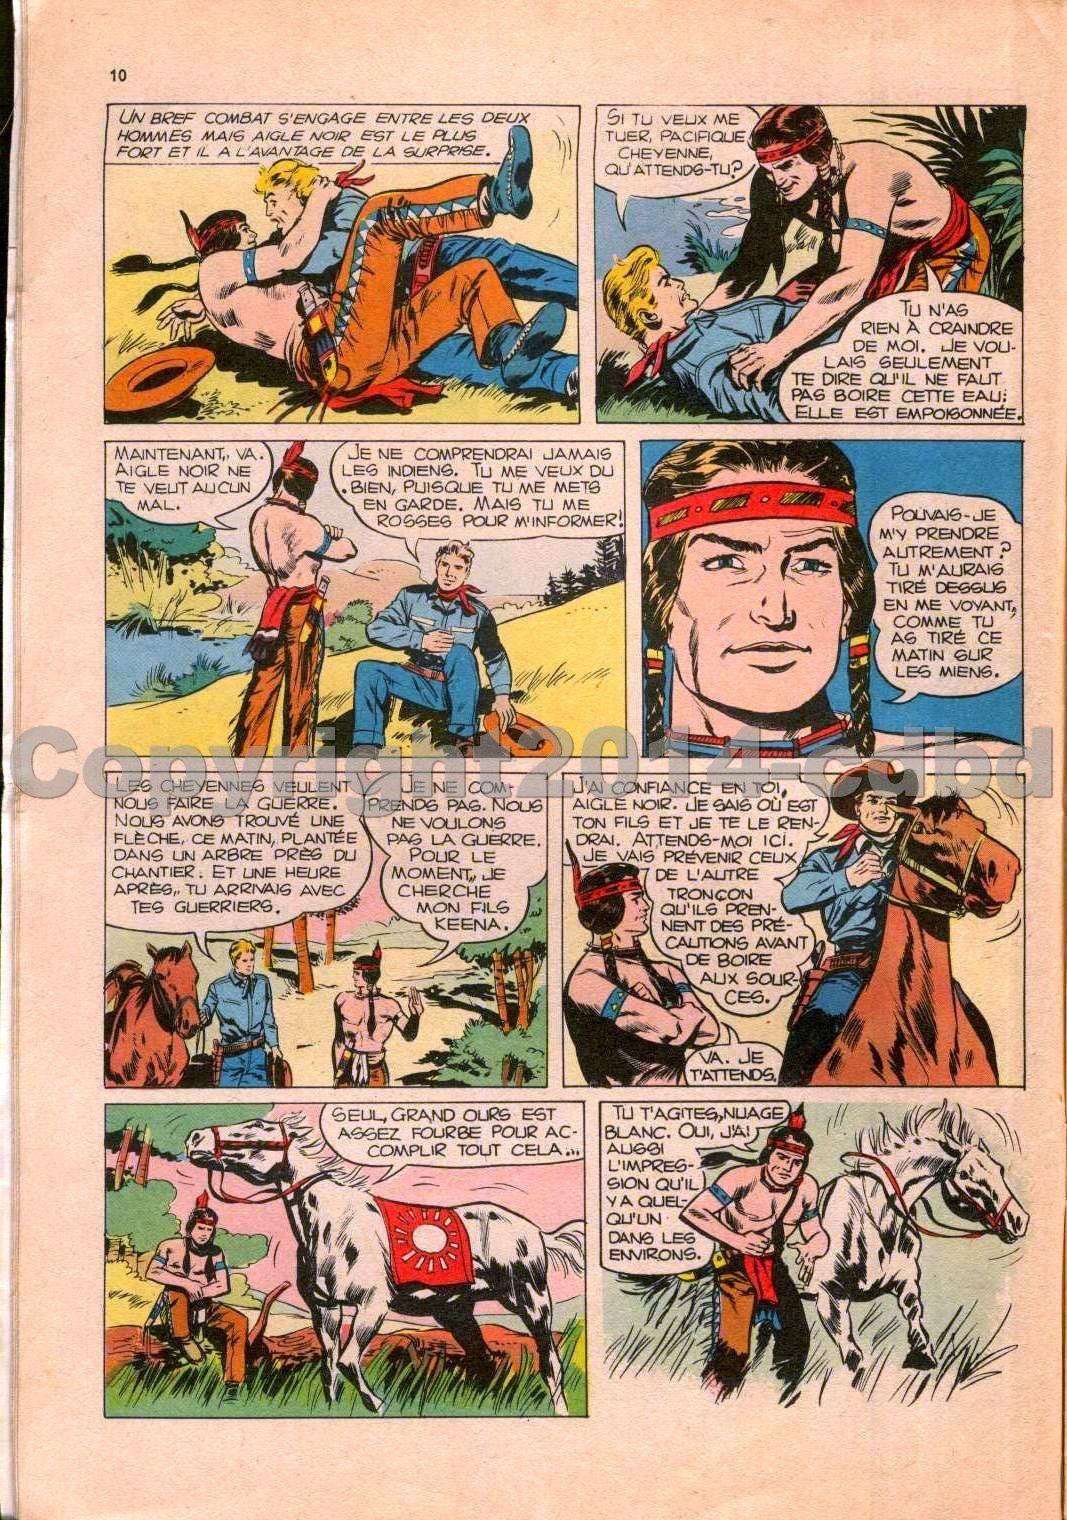 Impreg Comics Cool bandes dessinées disparues - cdbd - présentation de bandes